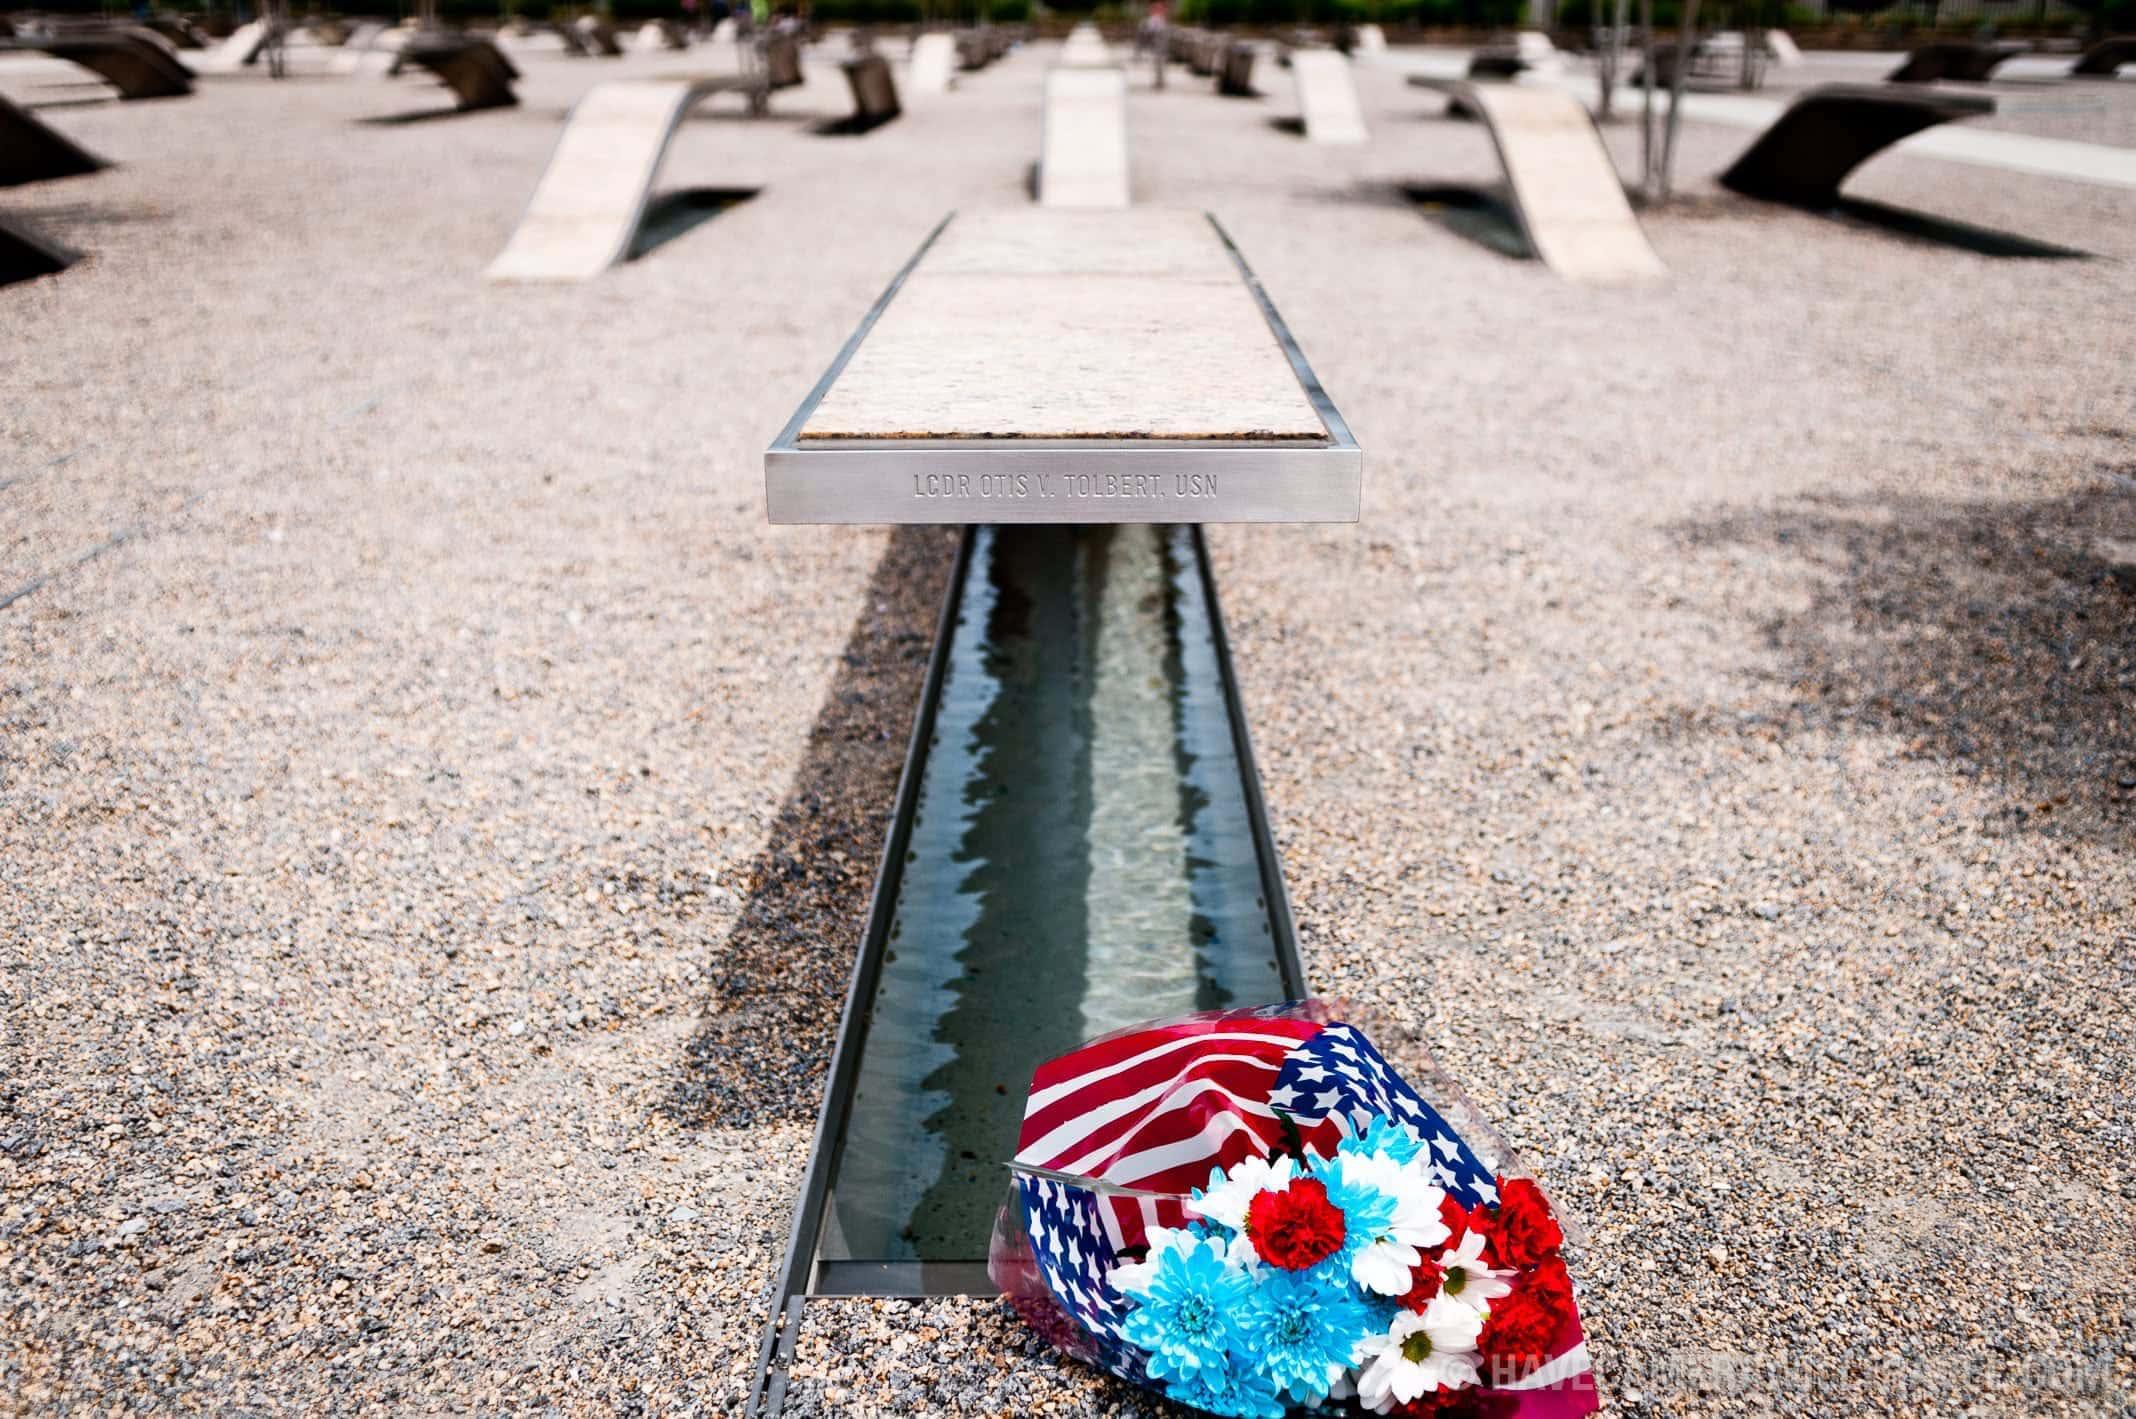 Pentagon Memorial with flowers